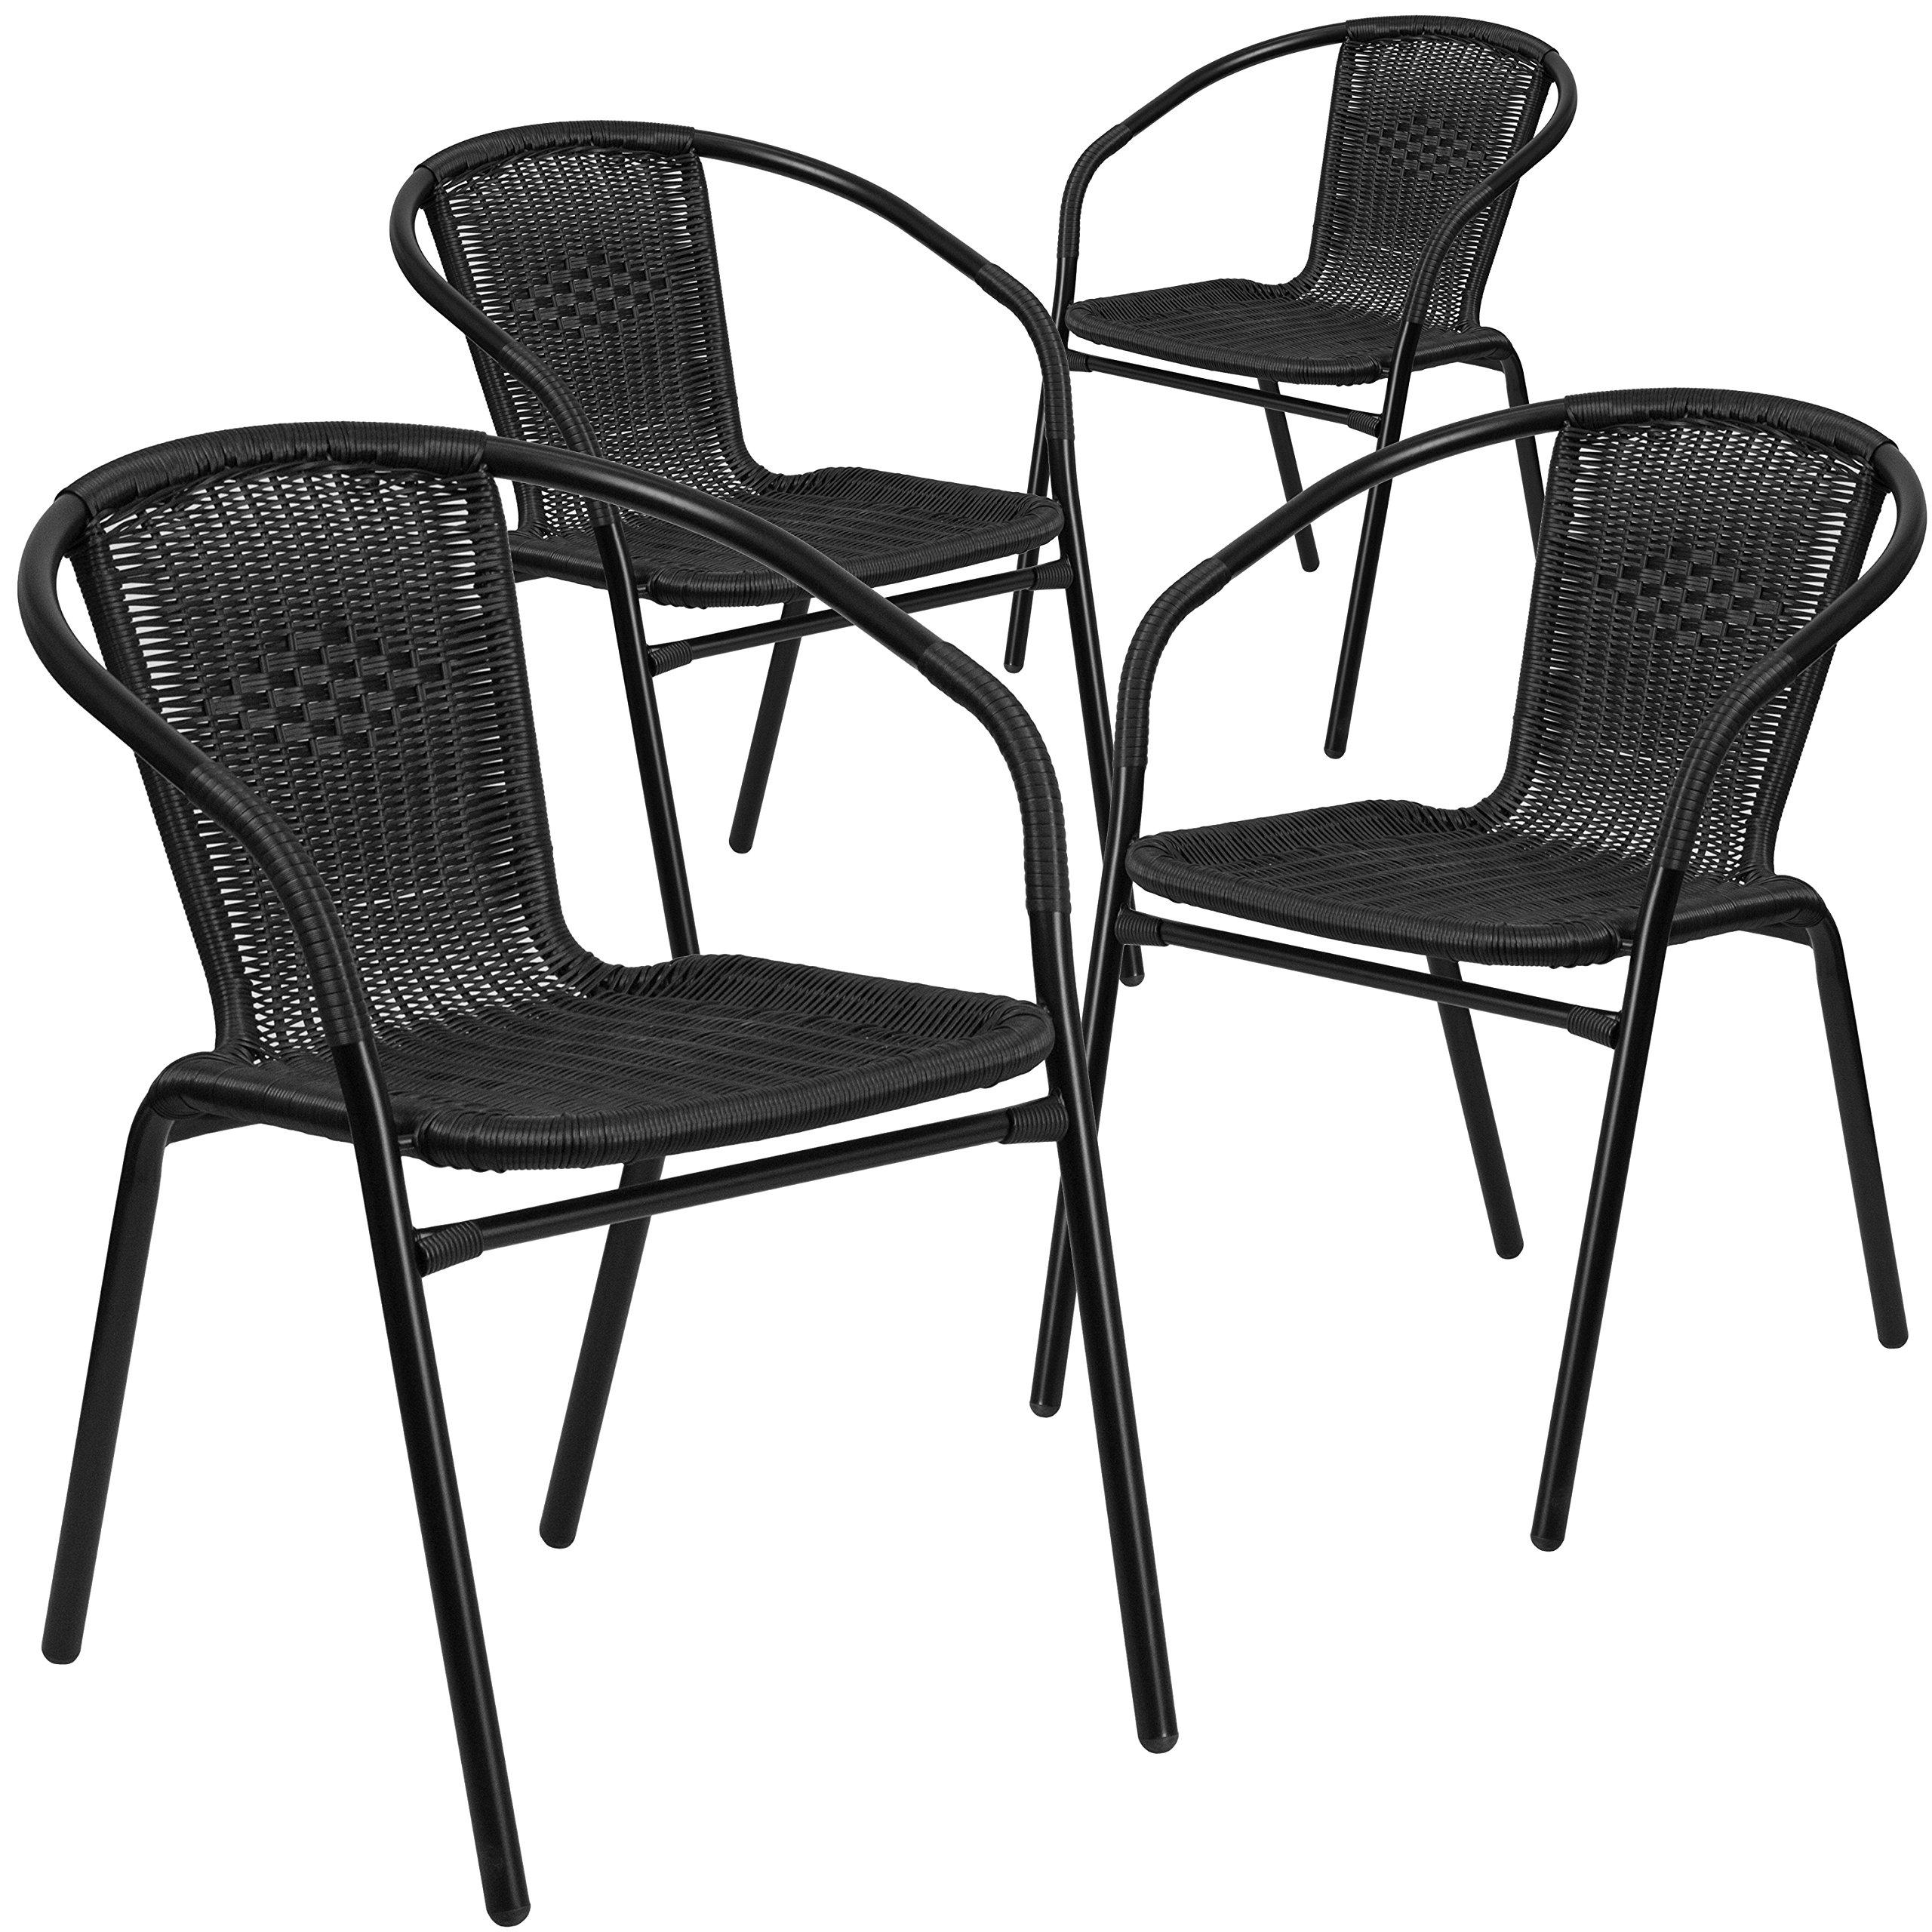 Flash Furniture 4 Pk. Black Rattan Indoor-Outdoor Restaurant Stack Chair by Flash Furniture